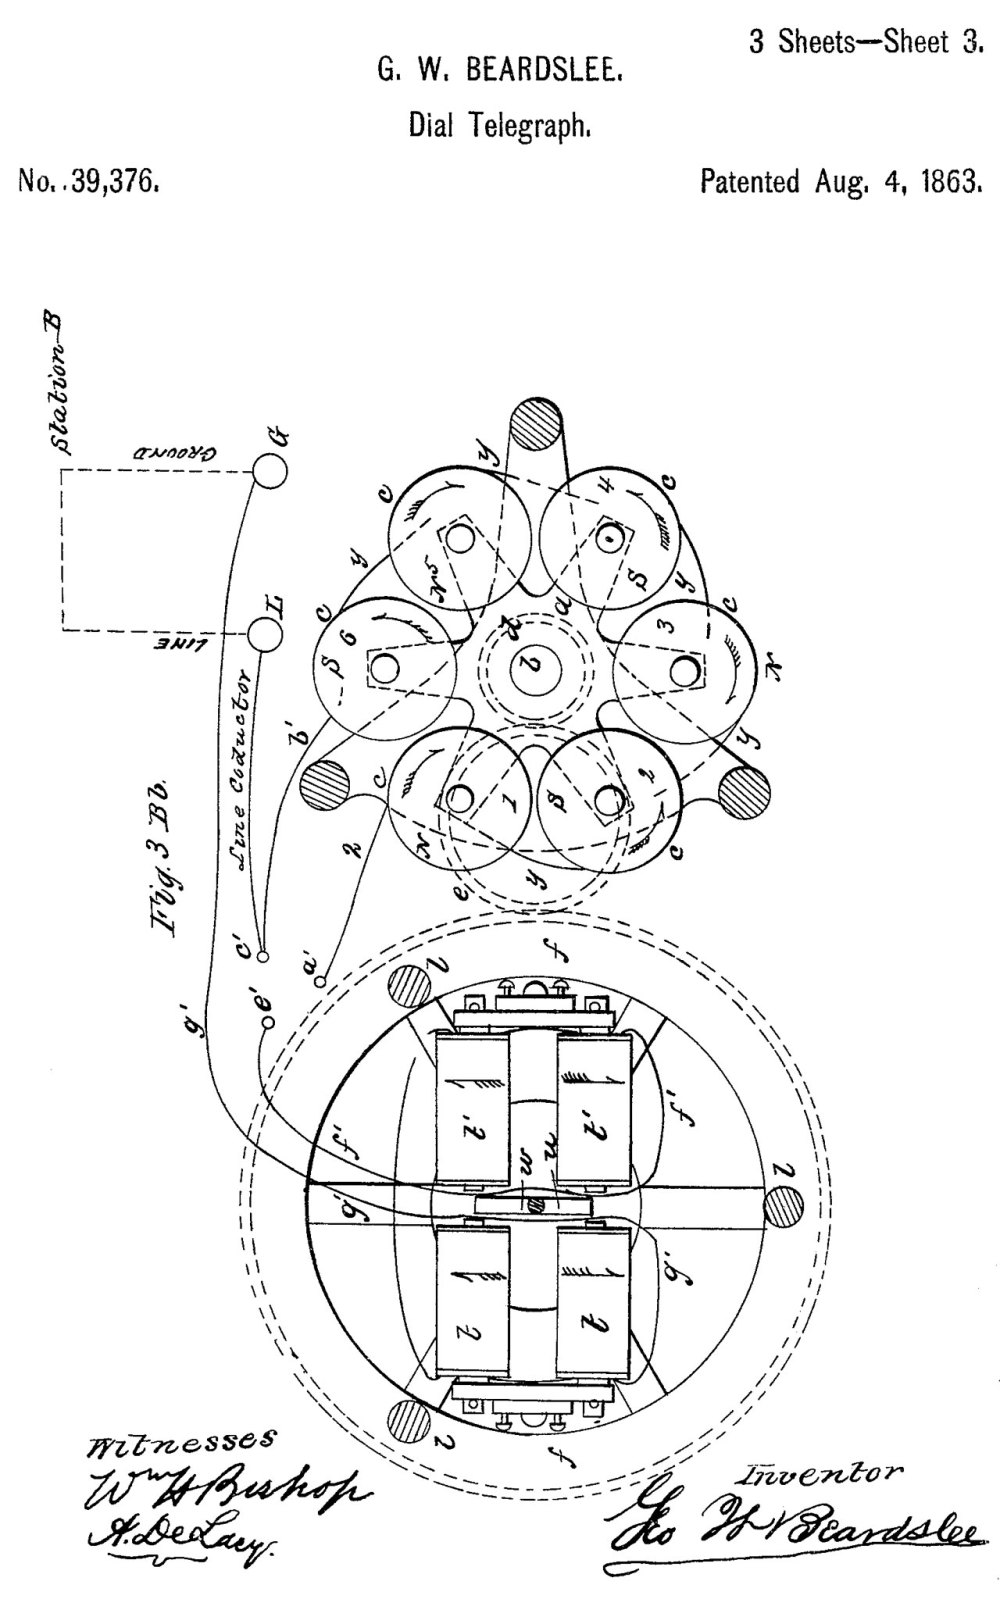 medium resolution of 39376 dial telegraph g w beardslee